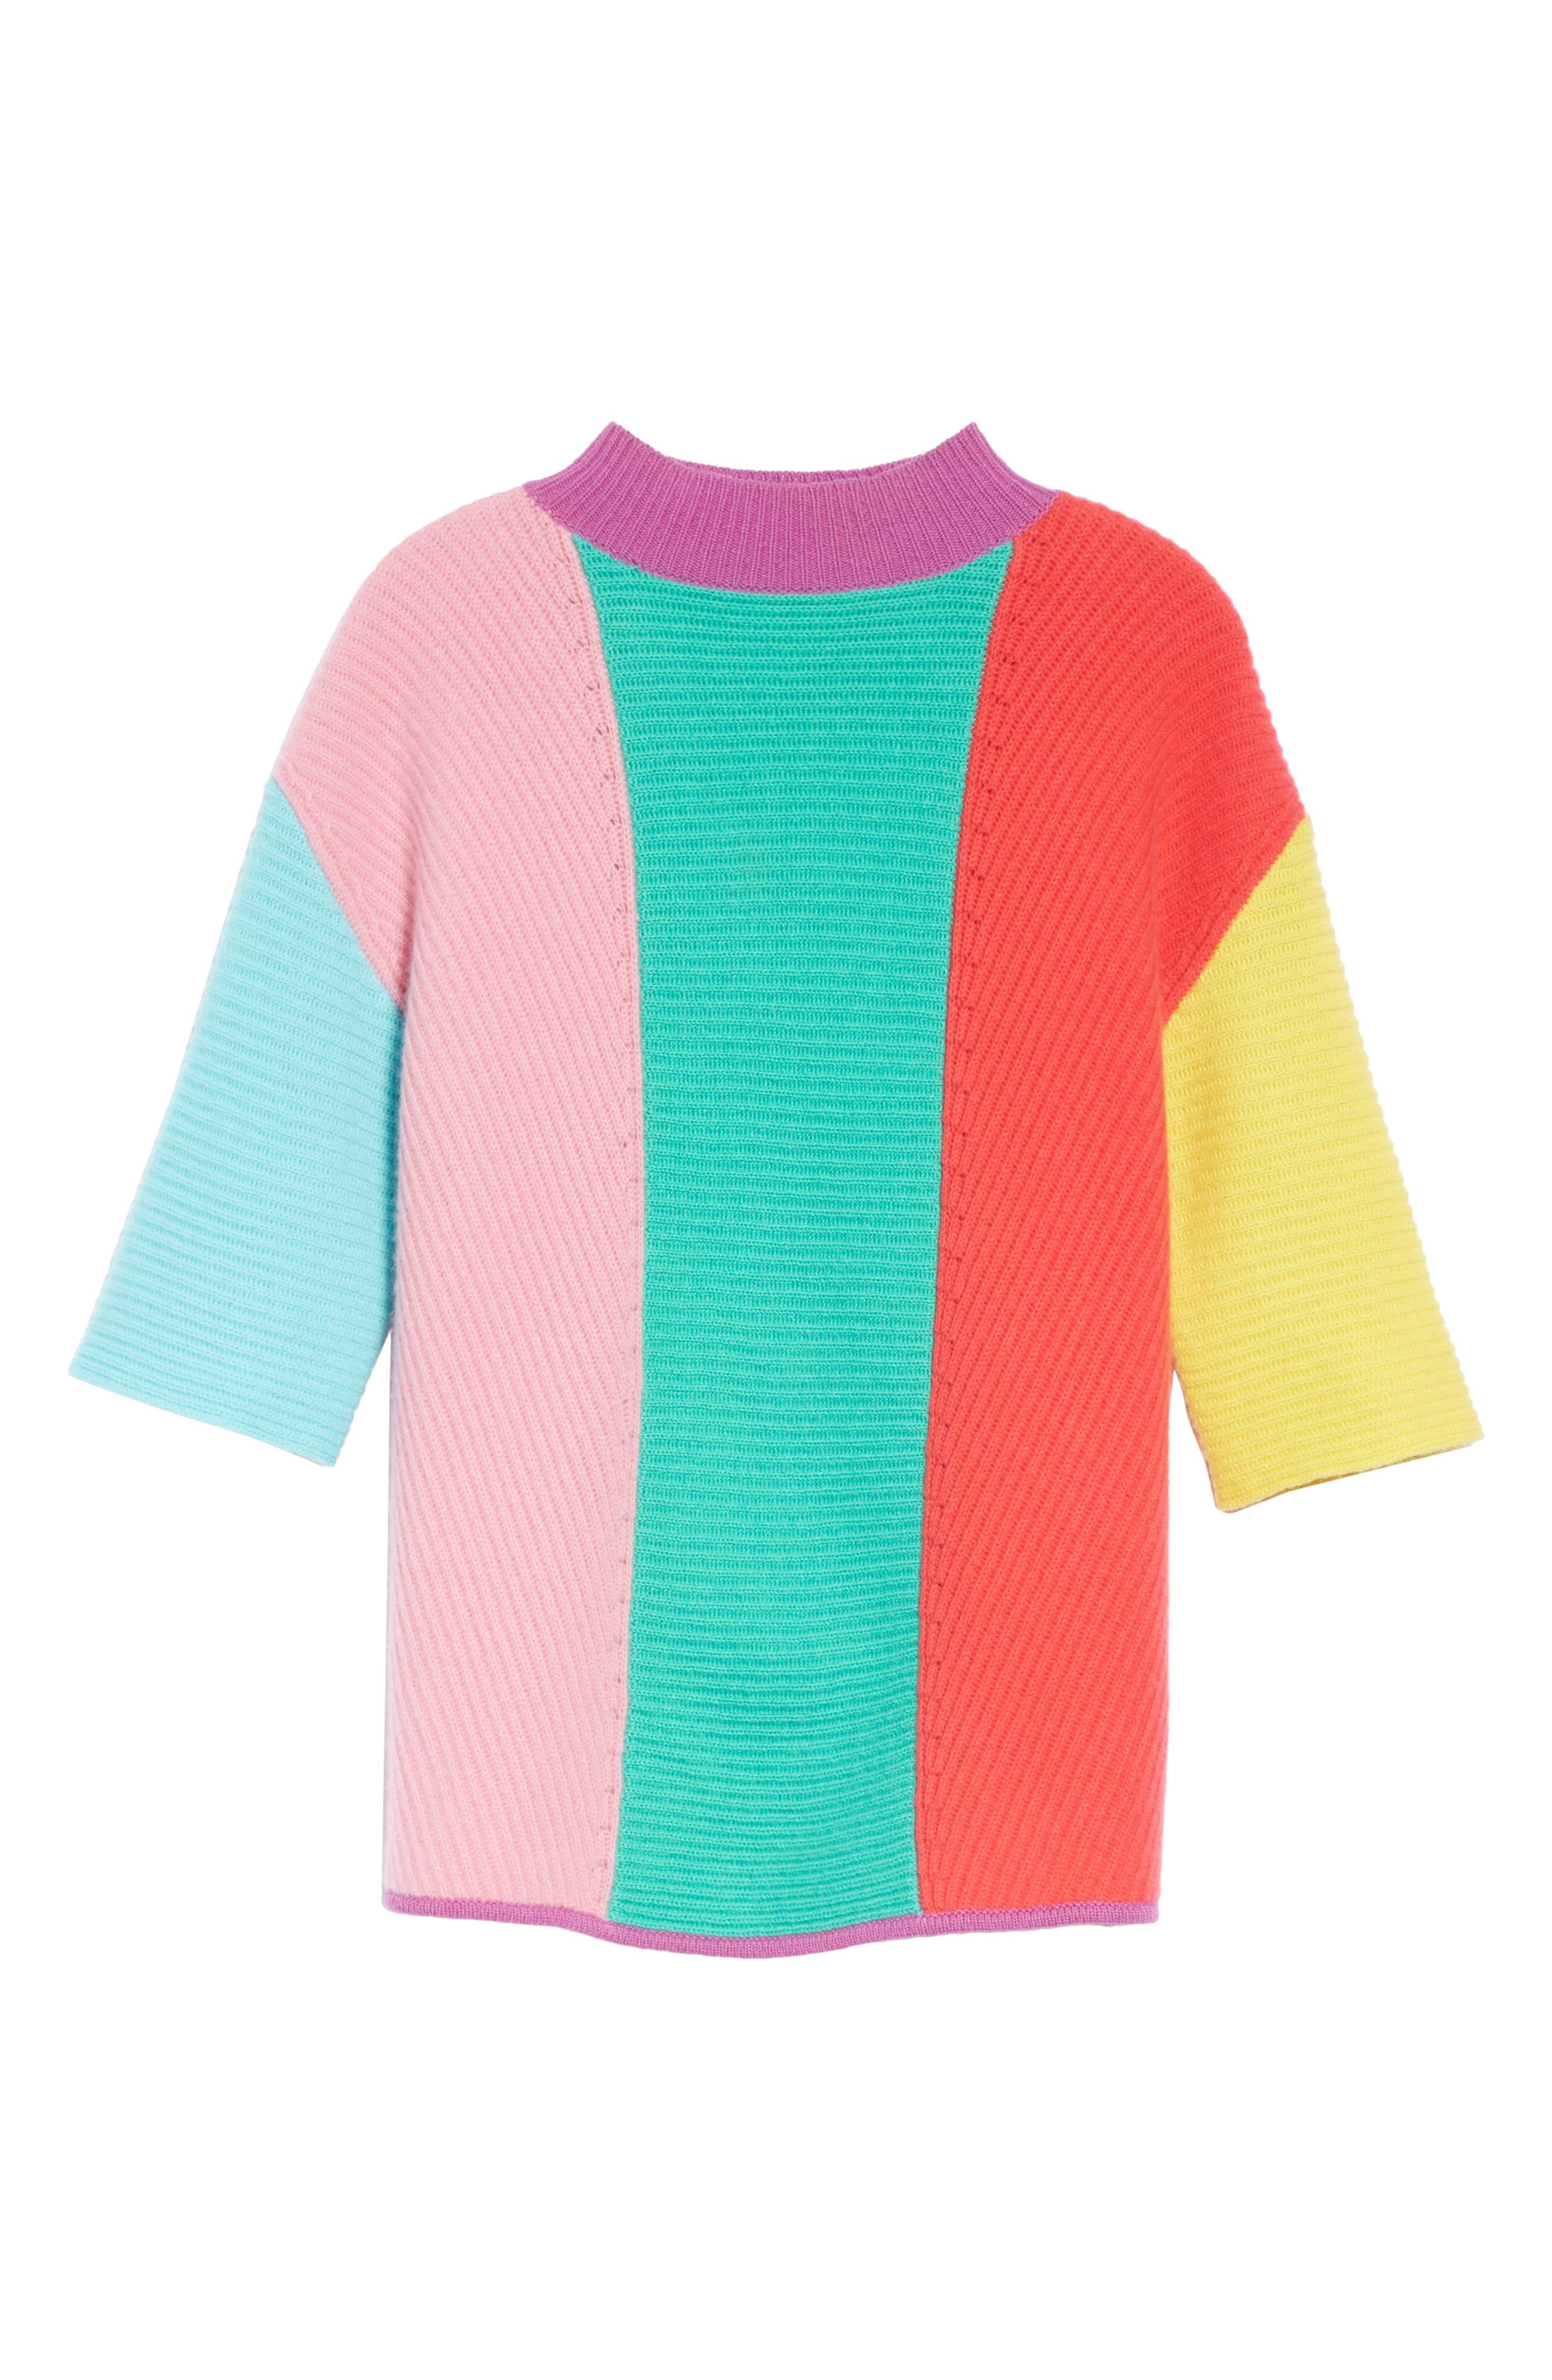 Stripe Short Sleeve Cashmere Sweater,                             Alternate thumbnail 6, color,                             MULTI